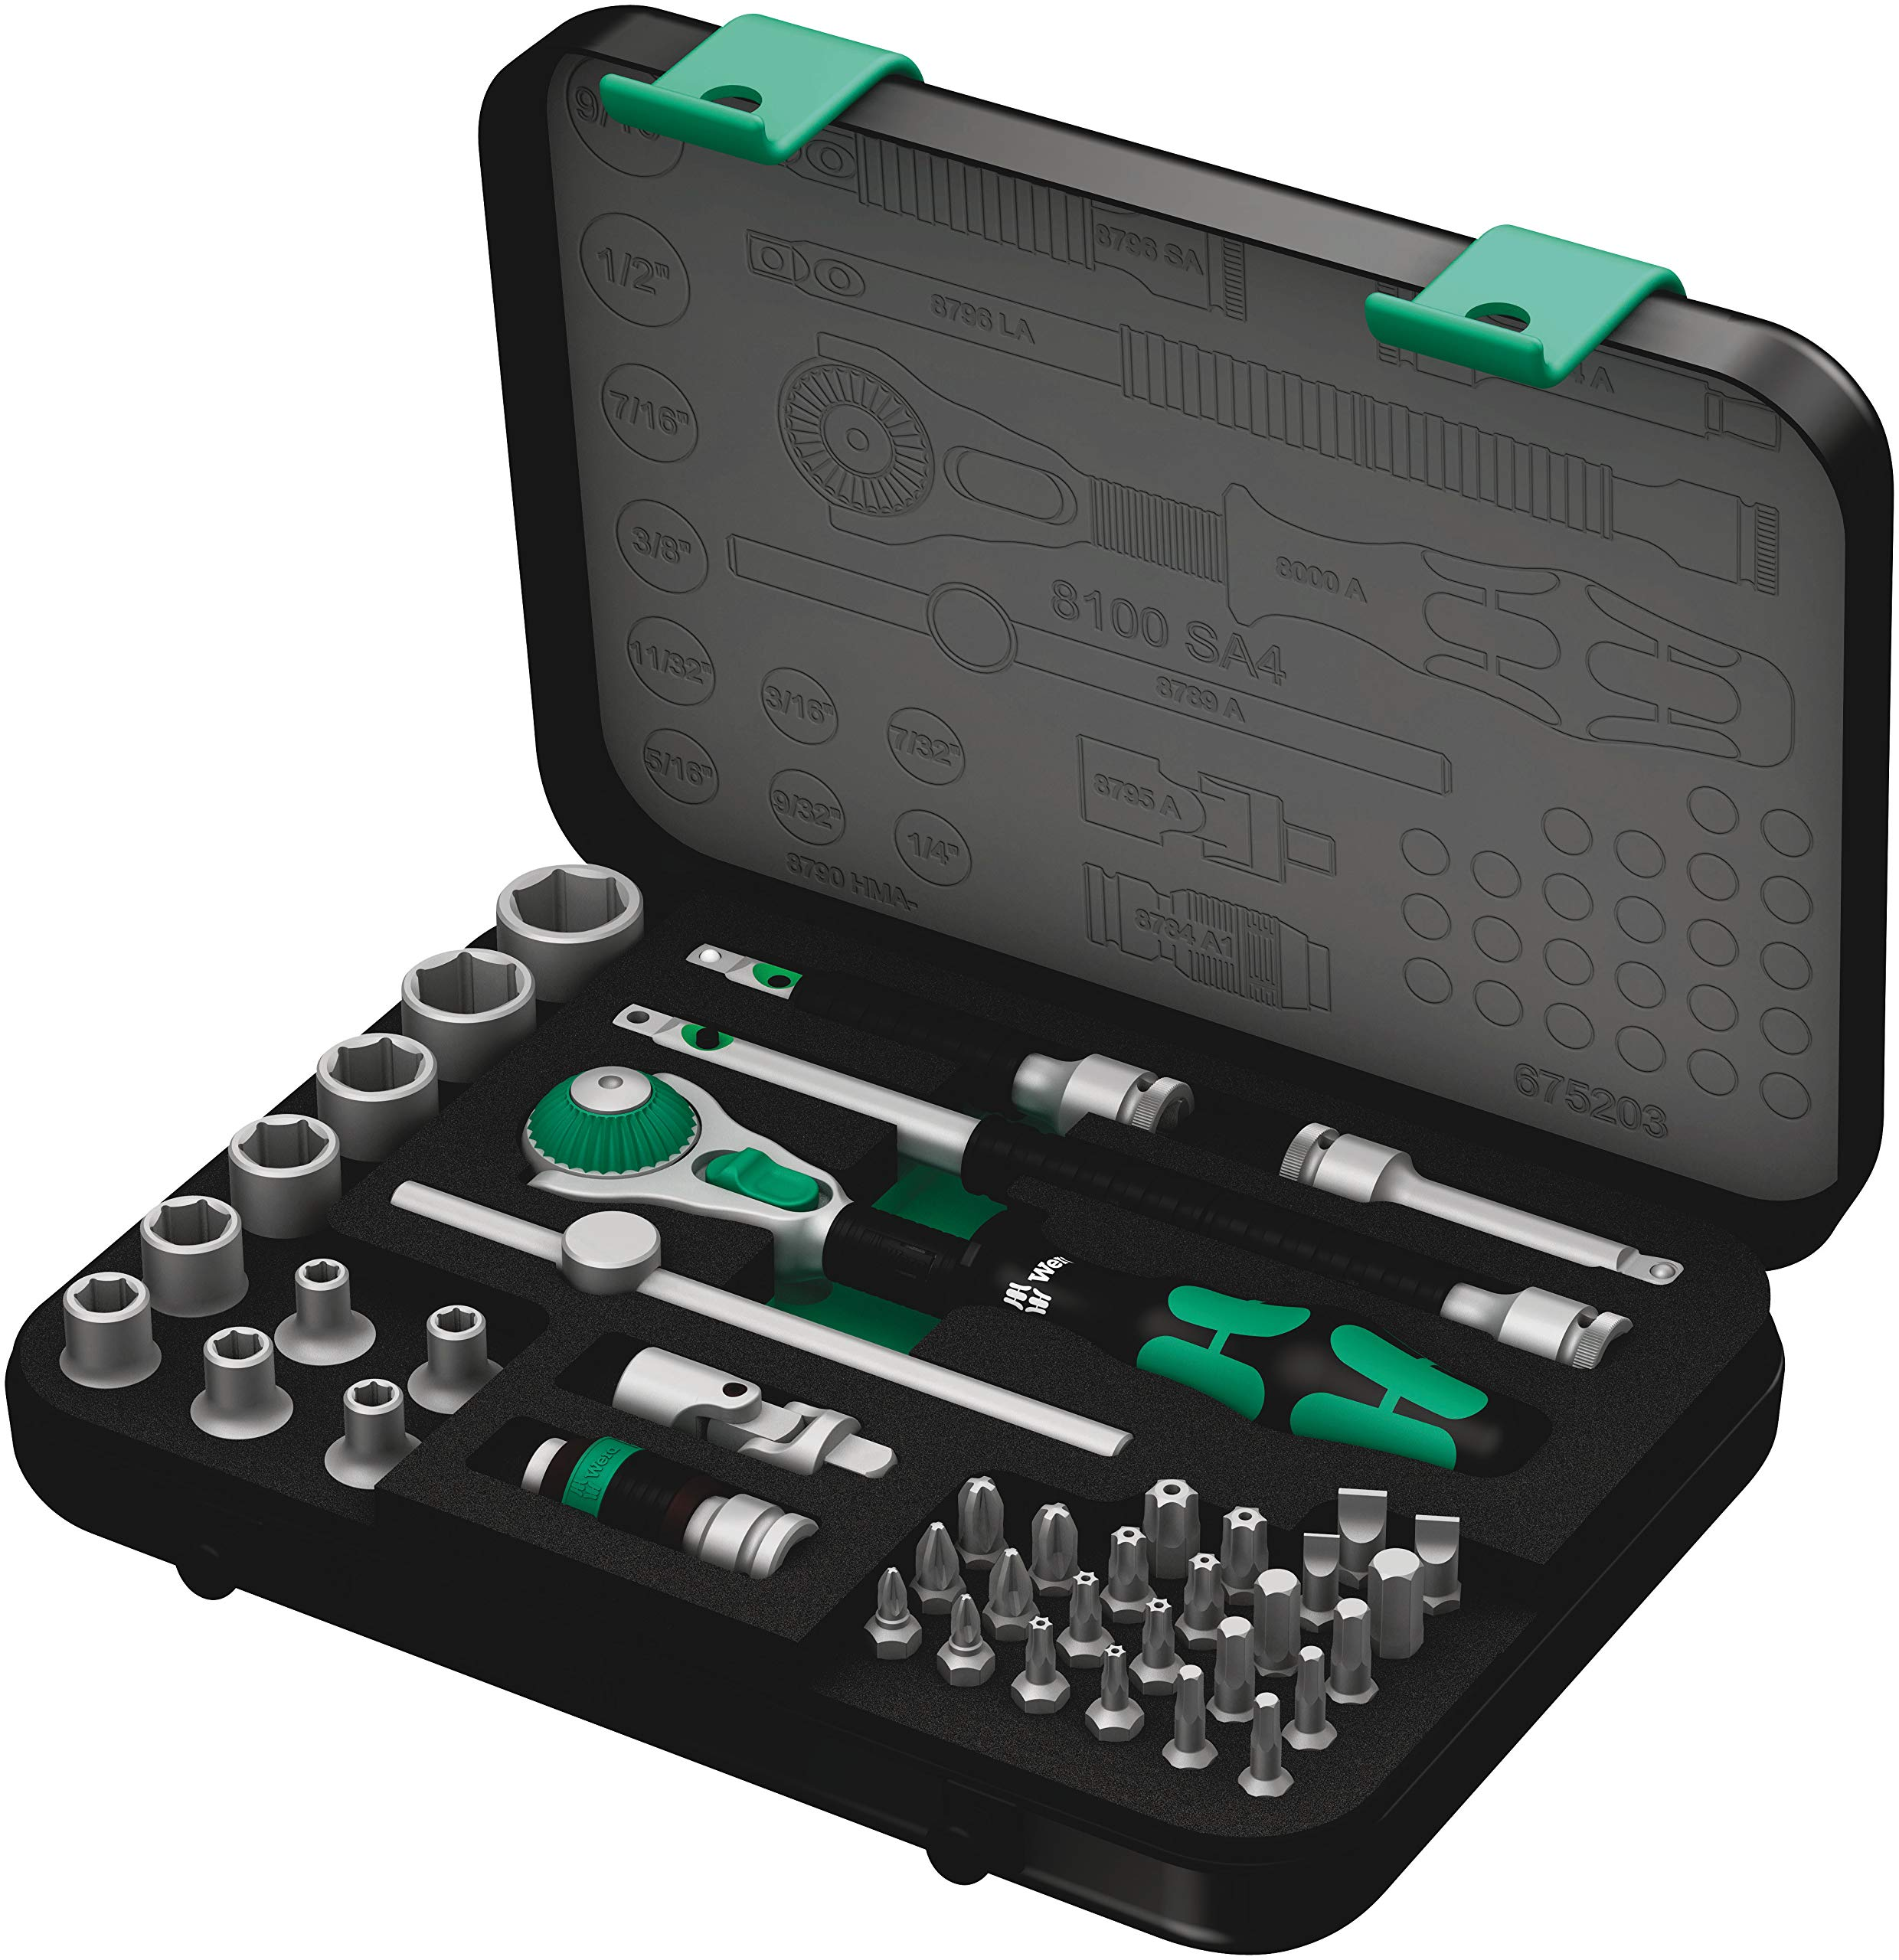 Wera 8100 SA 4 Zyklop Ratchet Set with 1/4'' Drive, 41-Piece Set